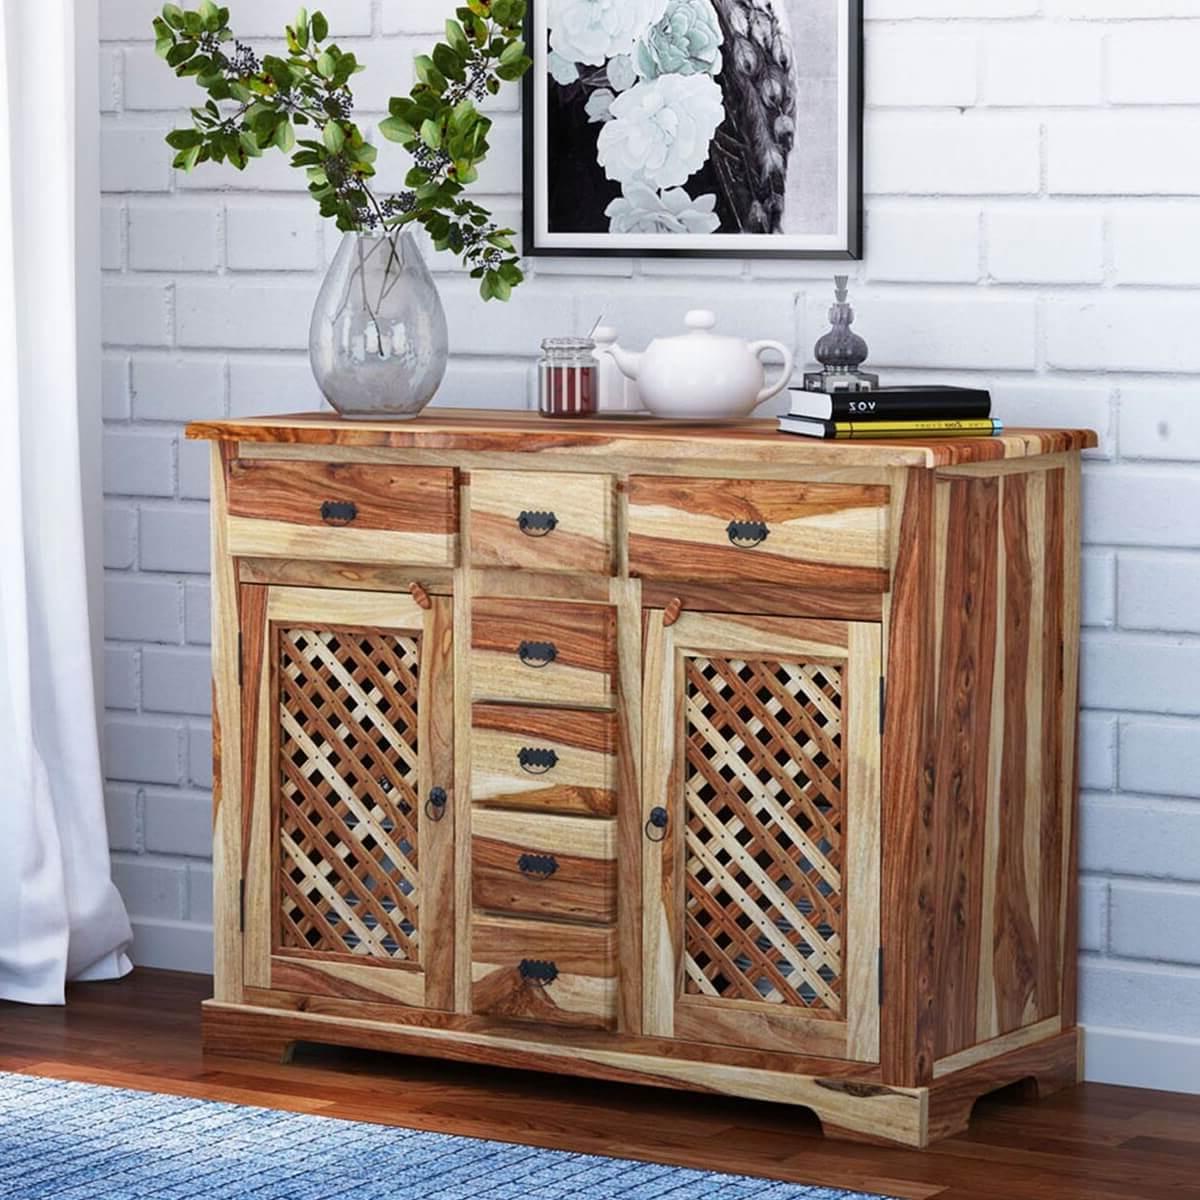 Galena Rustic Solid Wood Lattice Door 7 Drawer Sideboard Inside 2019 Courtdale Sideboards (View 8 of 20)